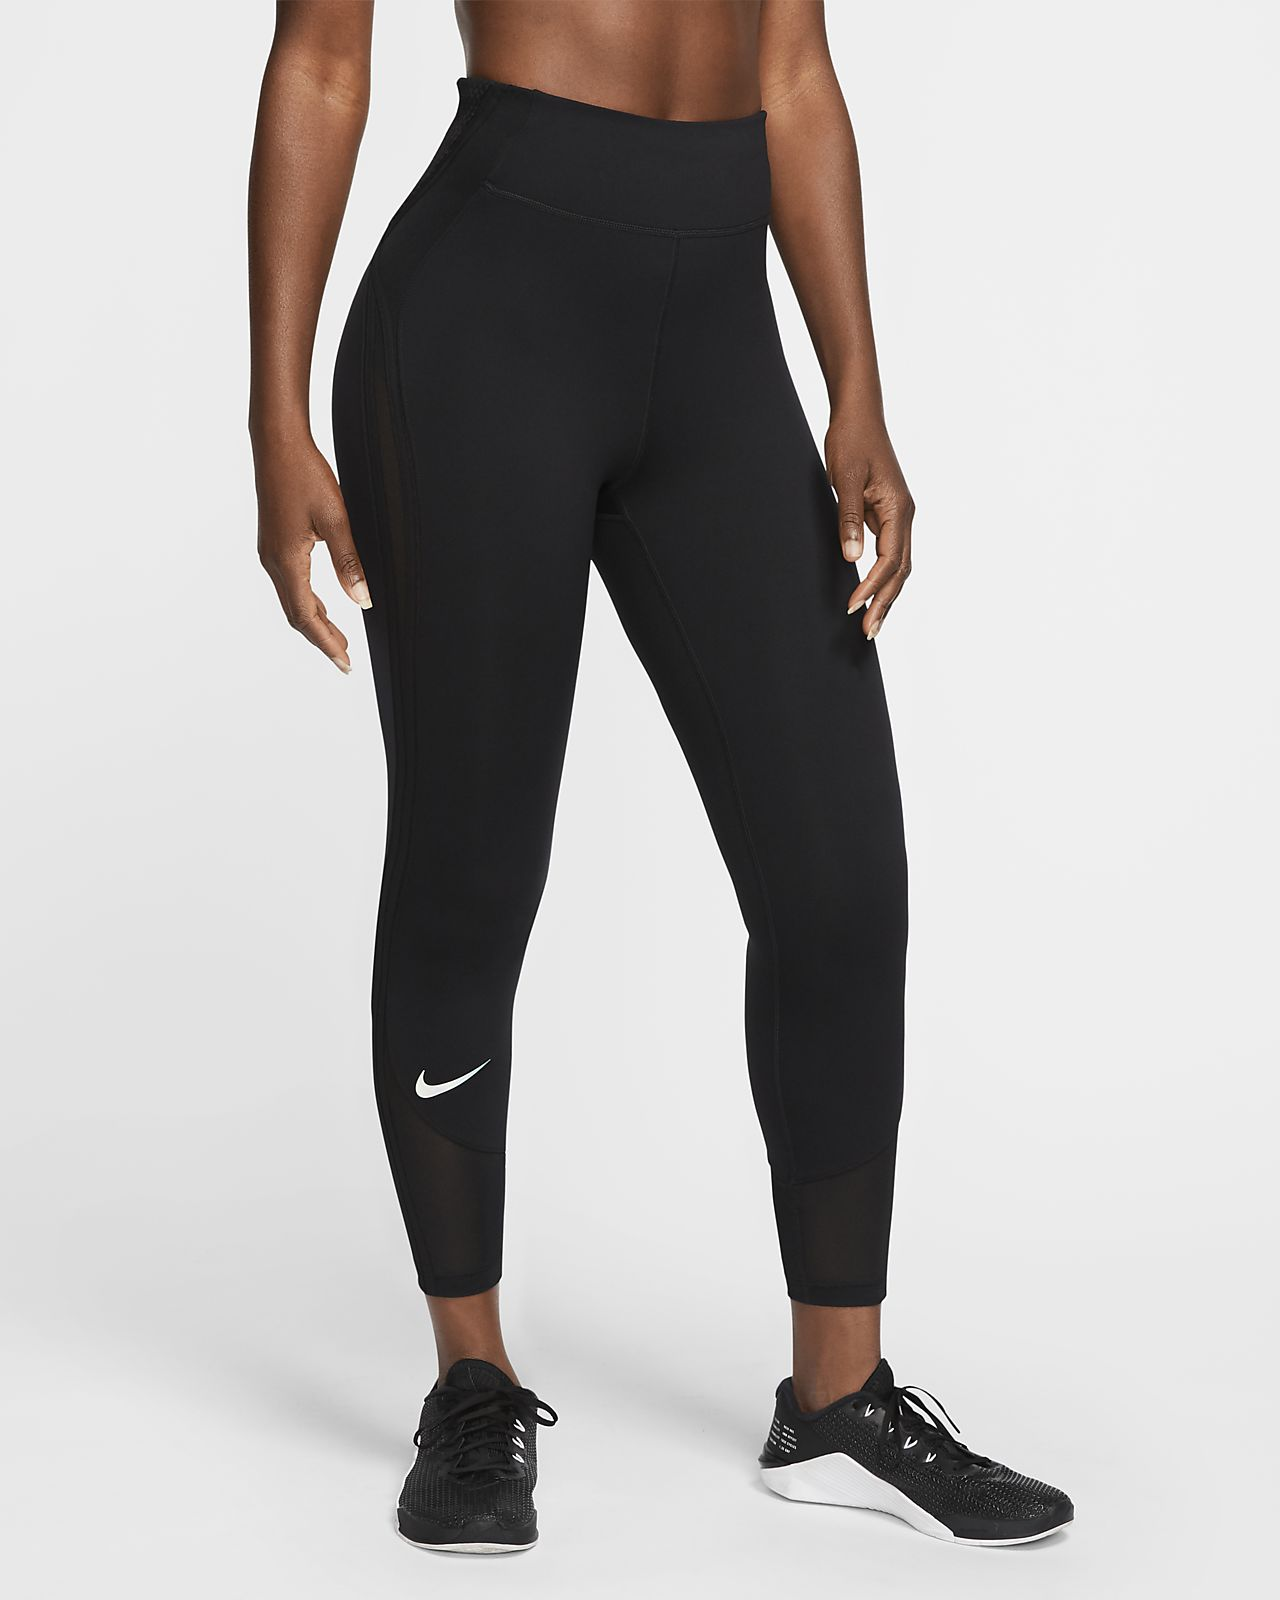 Nike City Ready Women's Training Tights